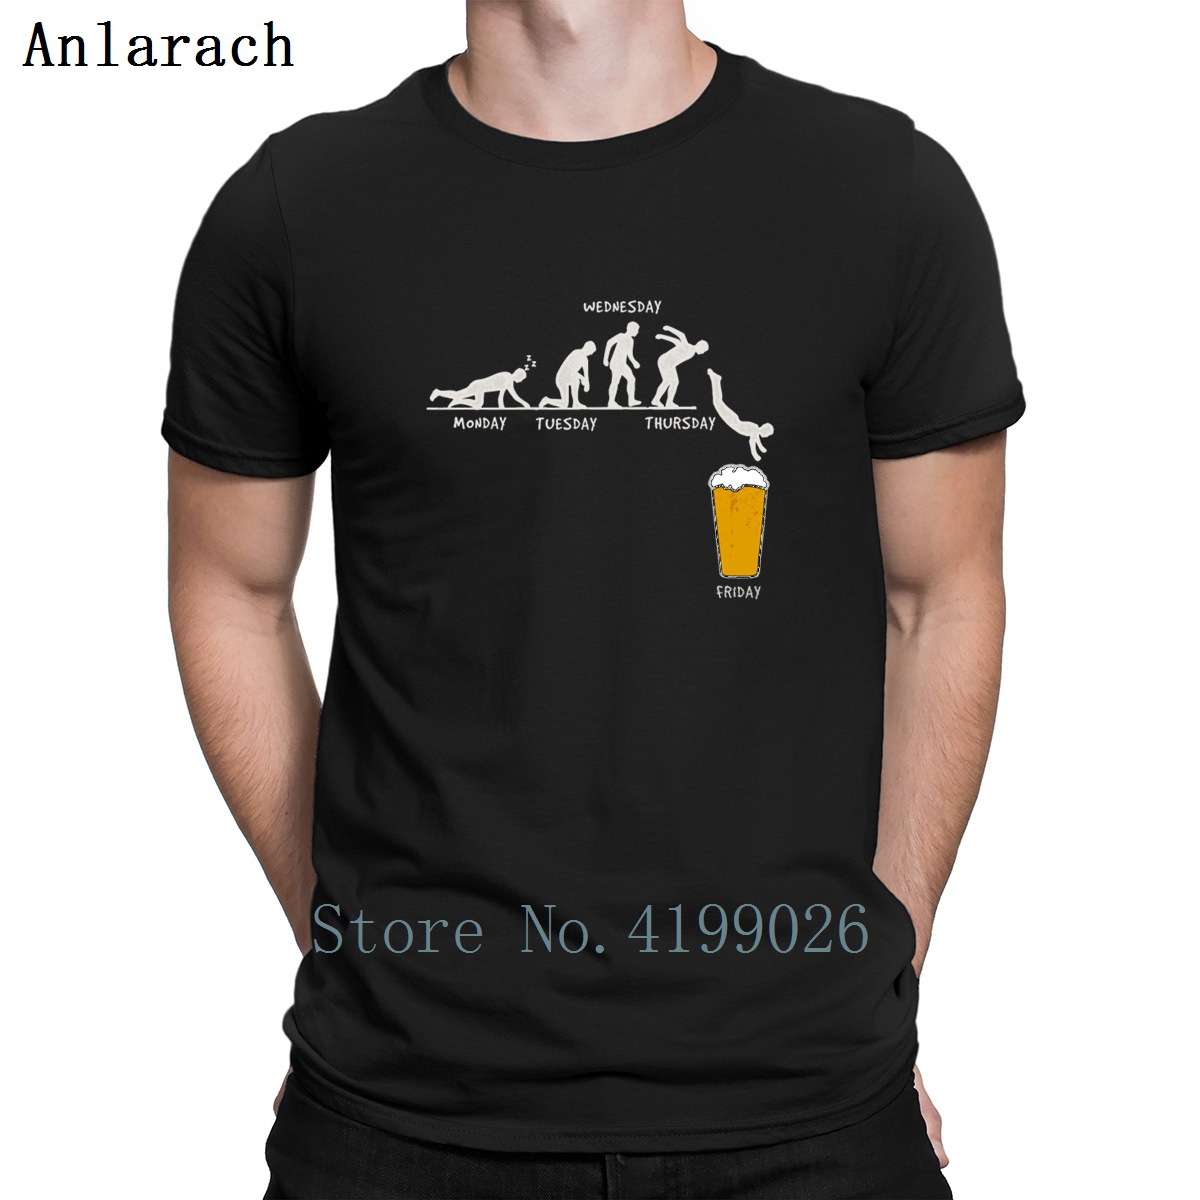 Week Craft Beer Design Funny T-Shirt Euro Size Formal Creative T Shirt For Men Solid Color Hip Hop Comical Tee Shirt Funky